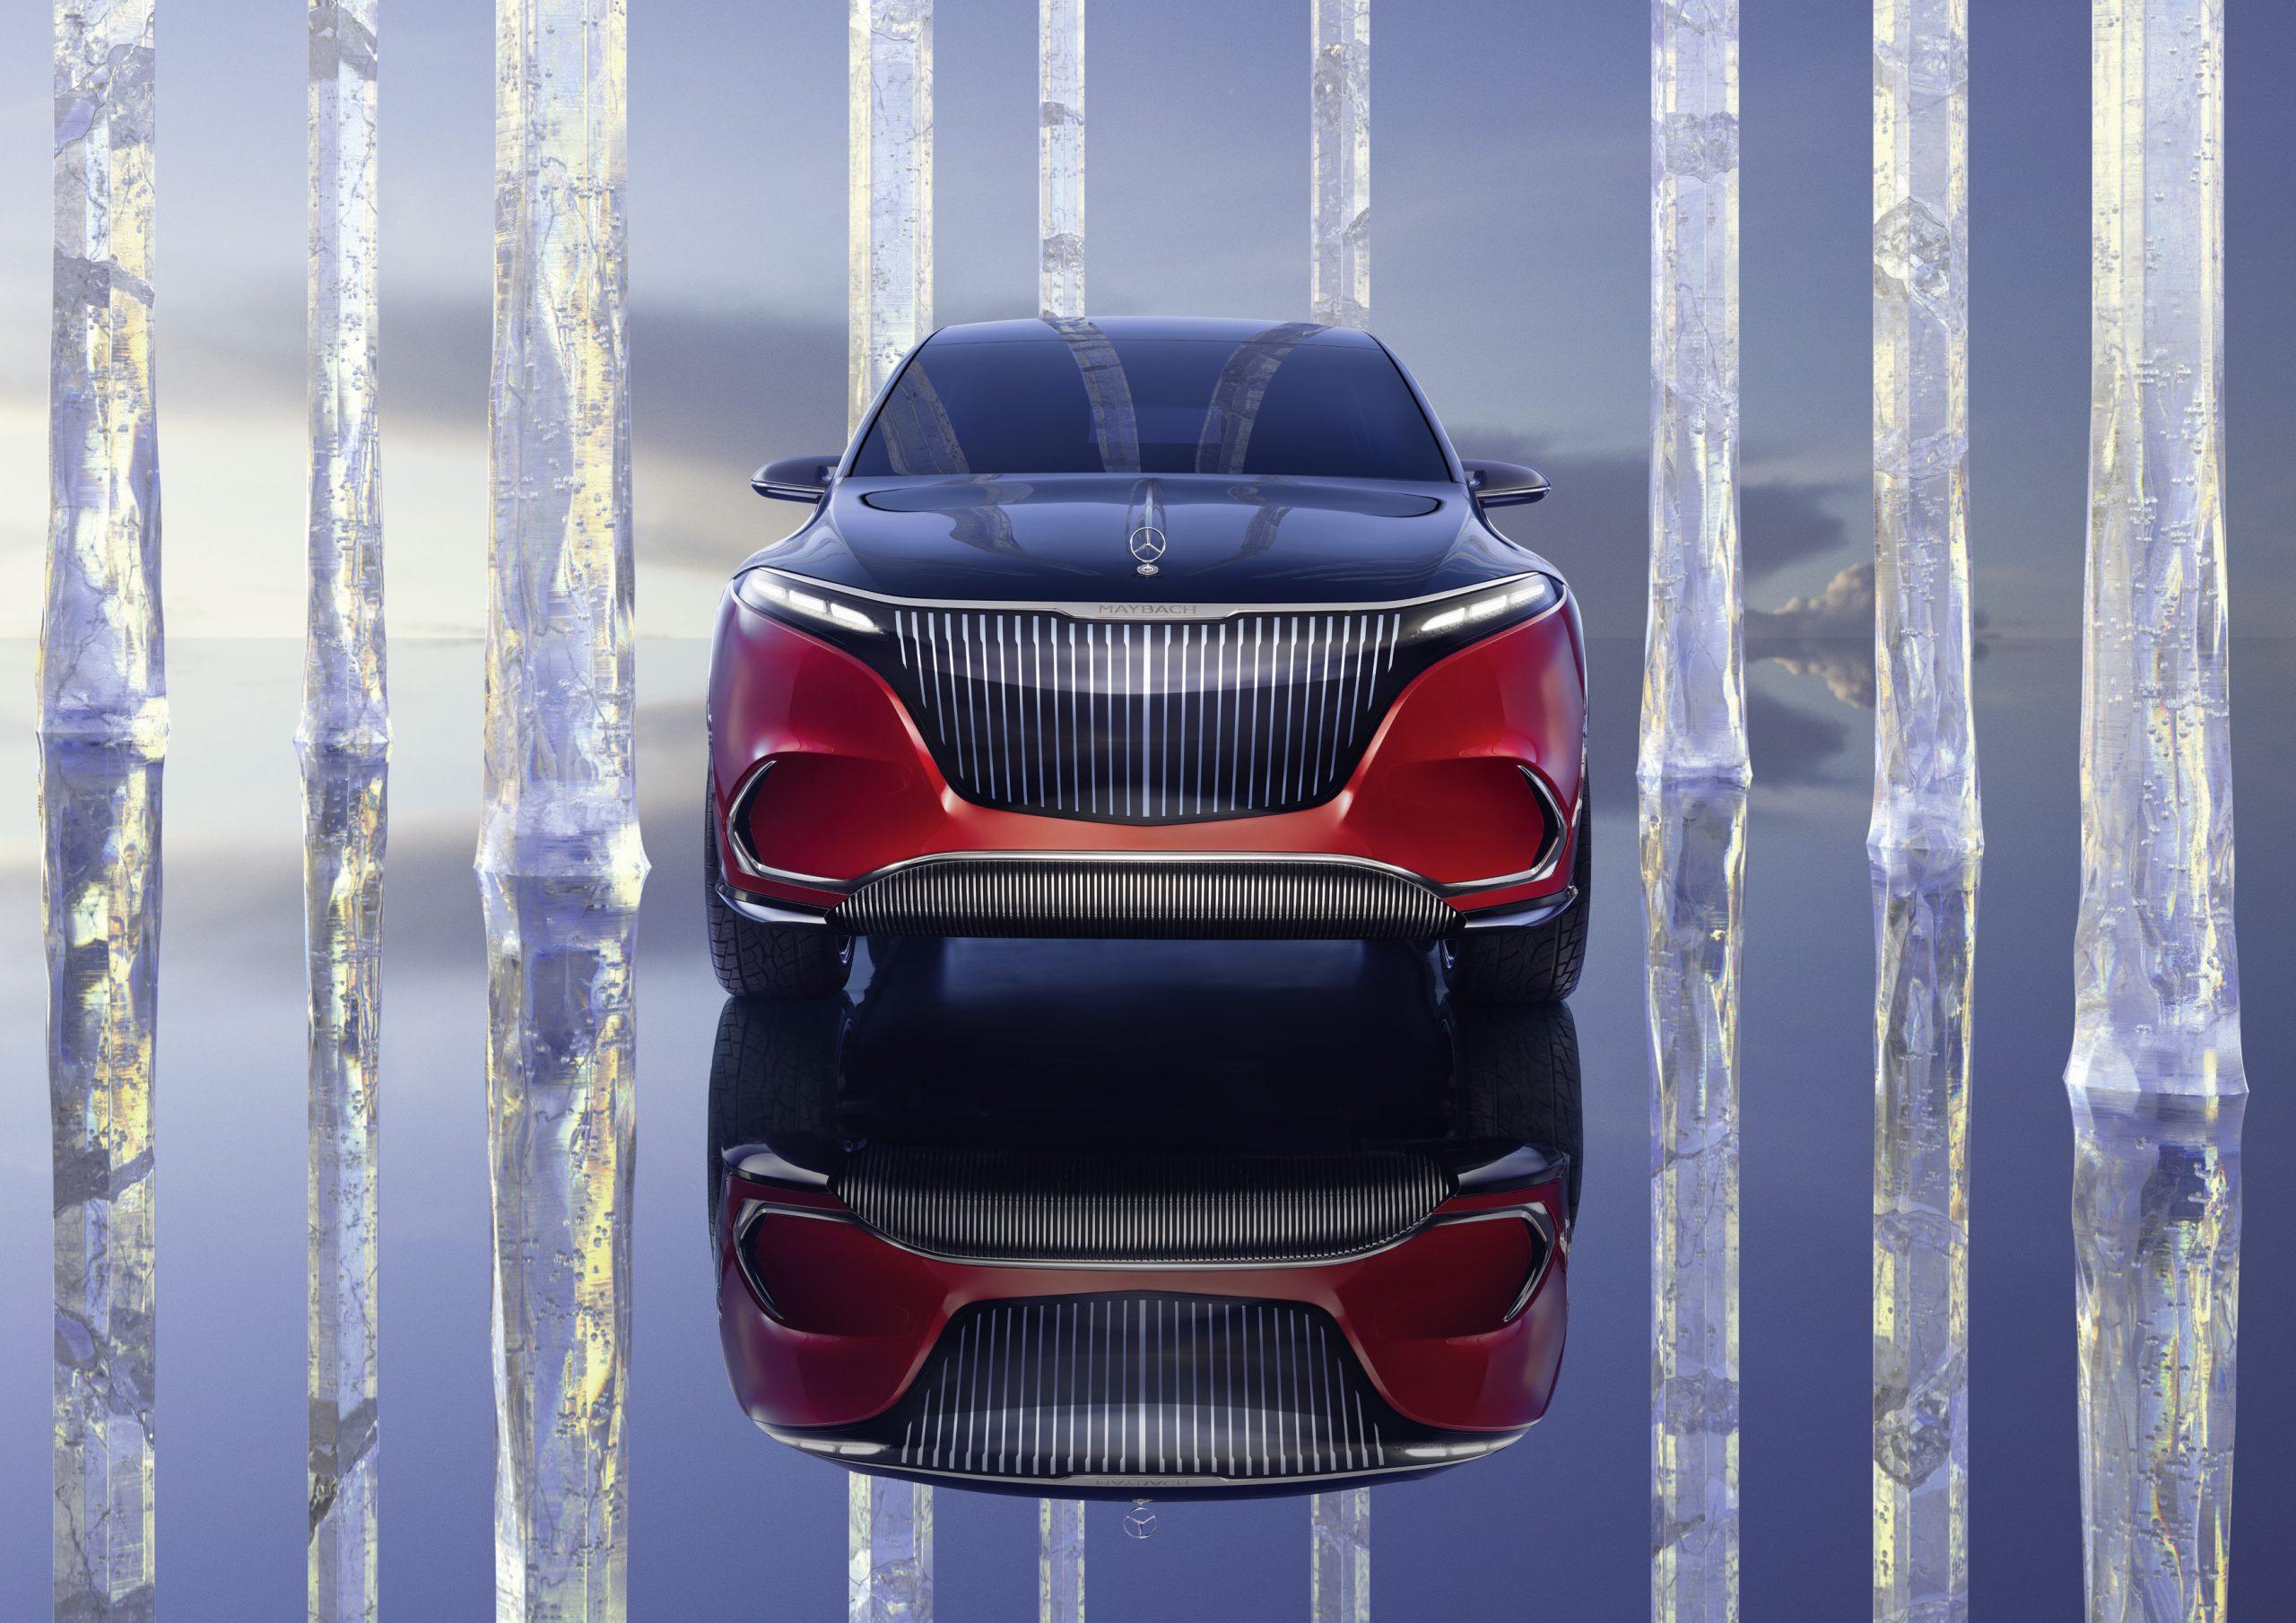 Mercedes Benz Maybach EQS Concept front